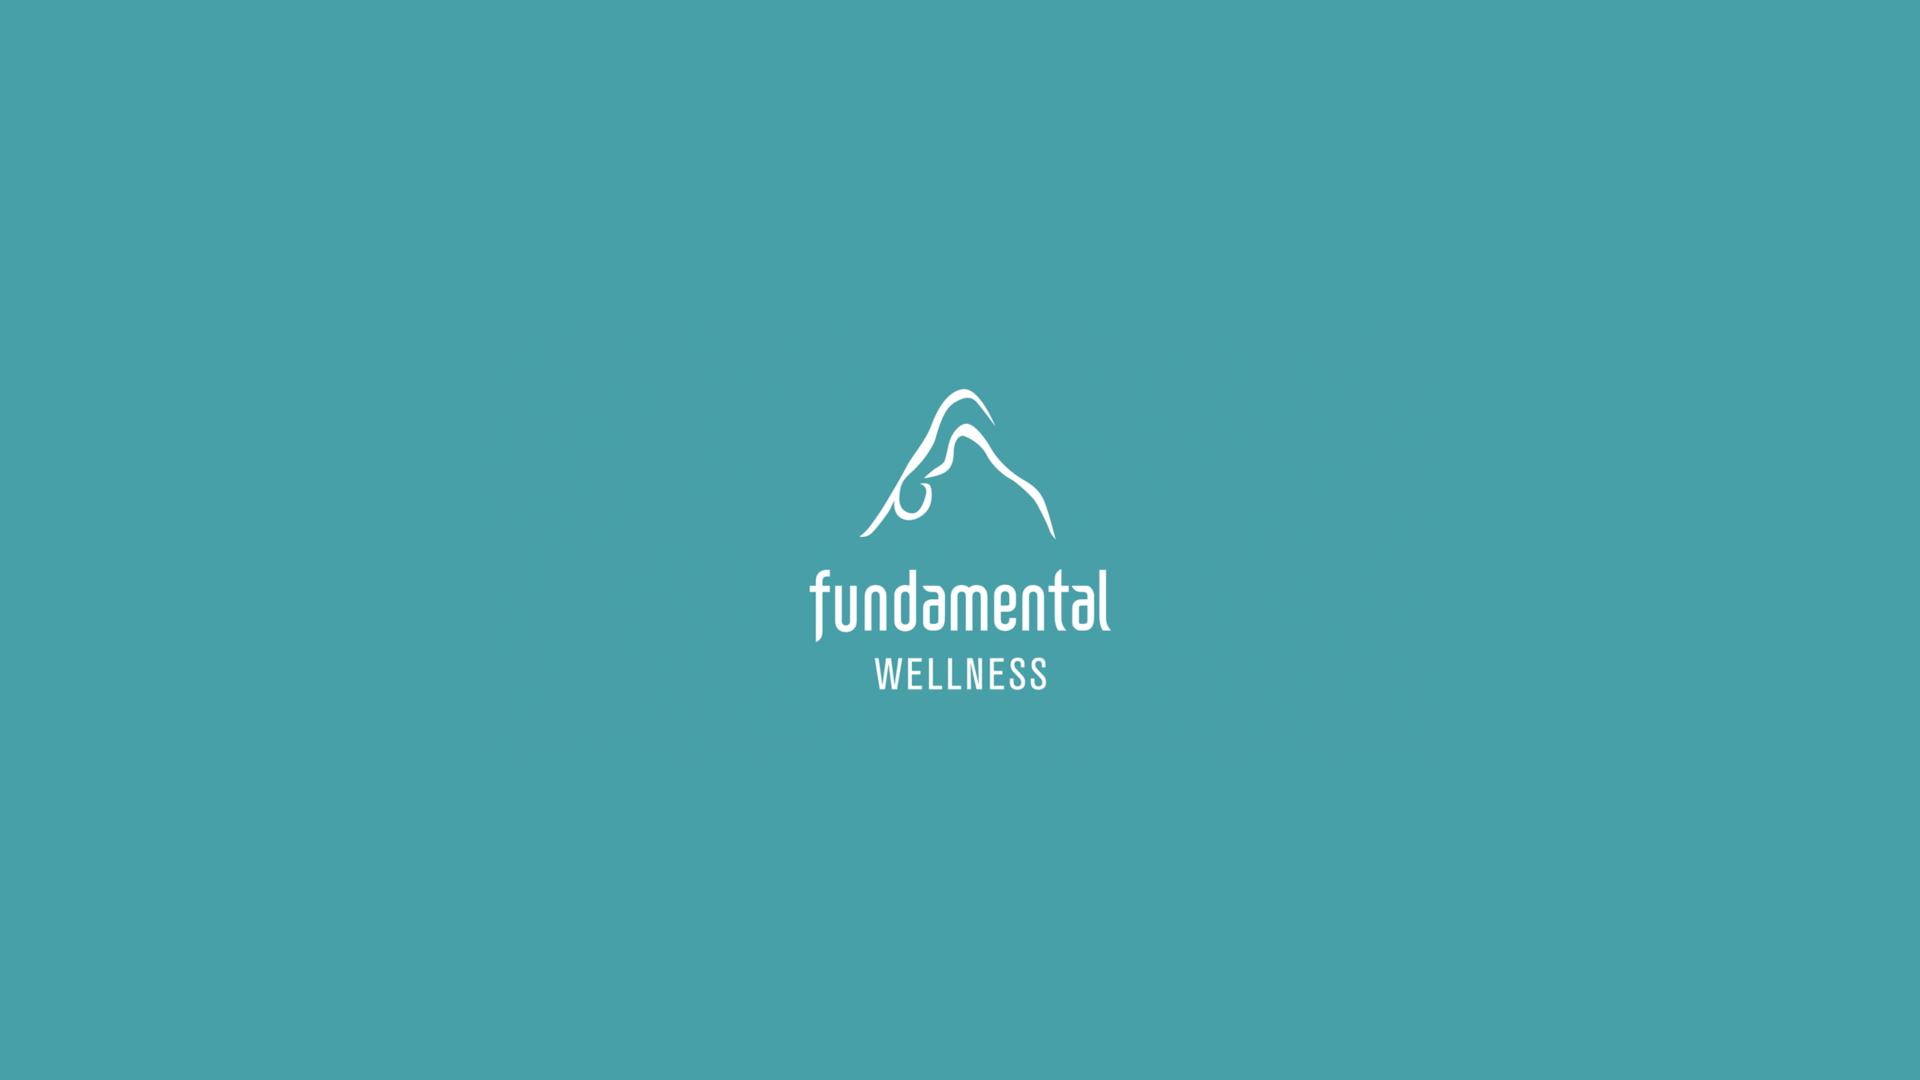 logotipo Fundamental Wellness Pliegues